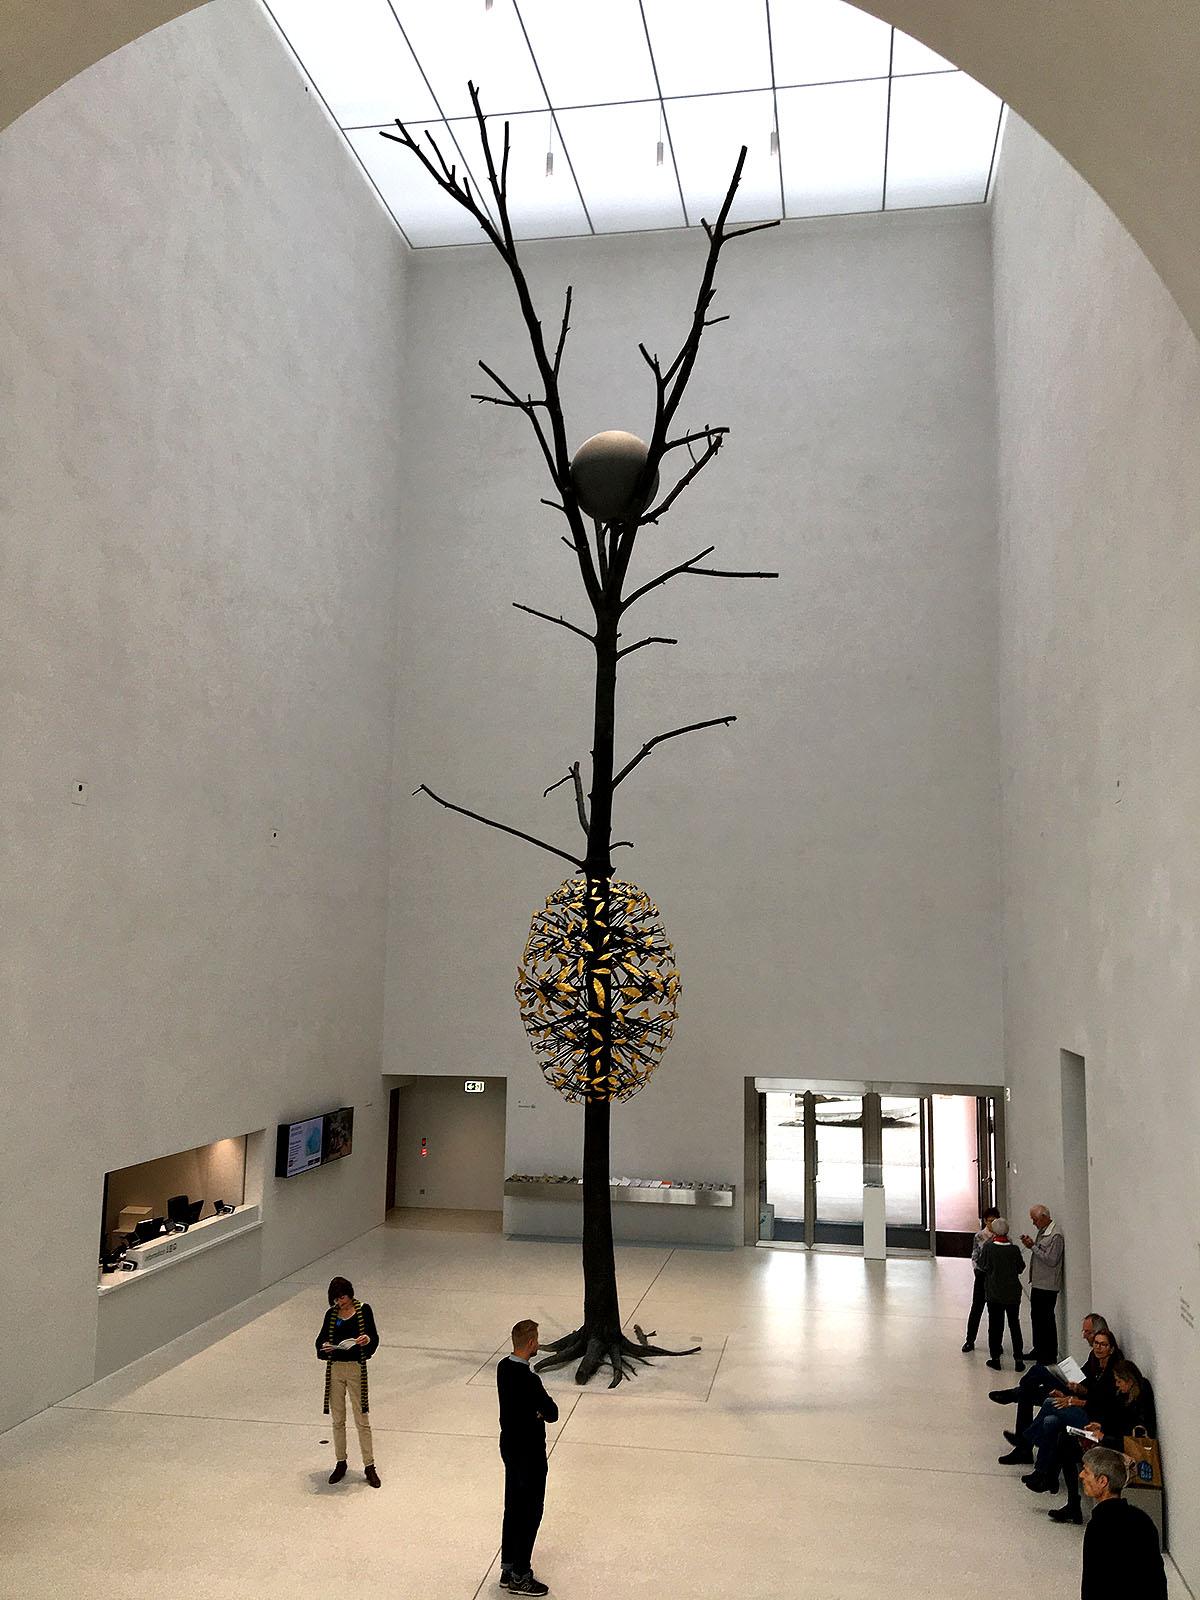 Giuseppe Penone's 15-metre bronze Nut Tree sculpture